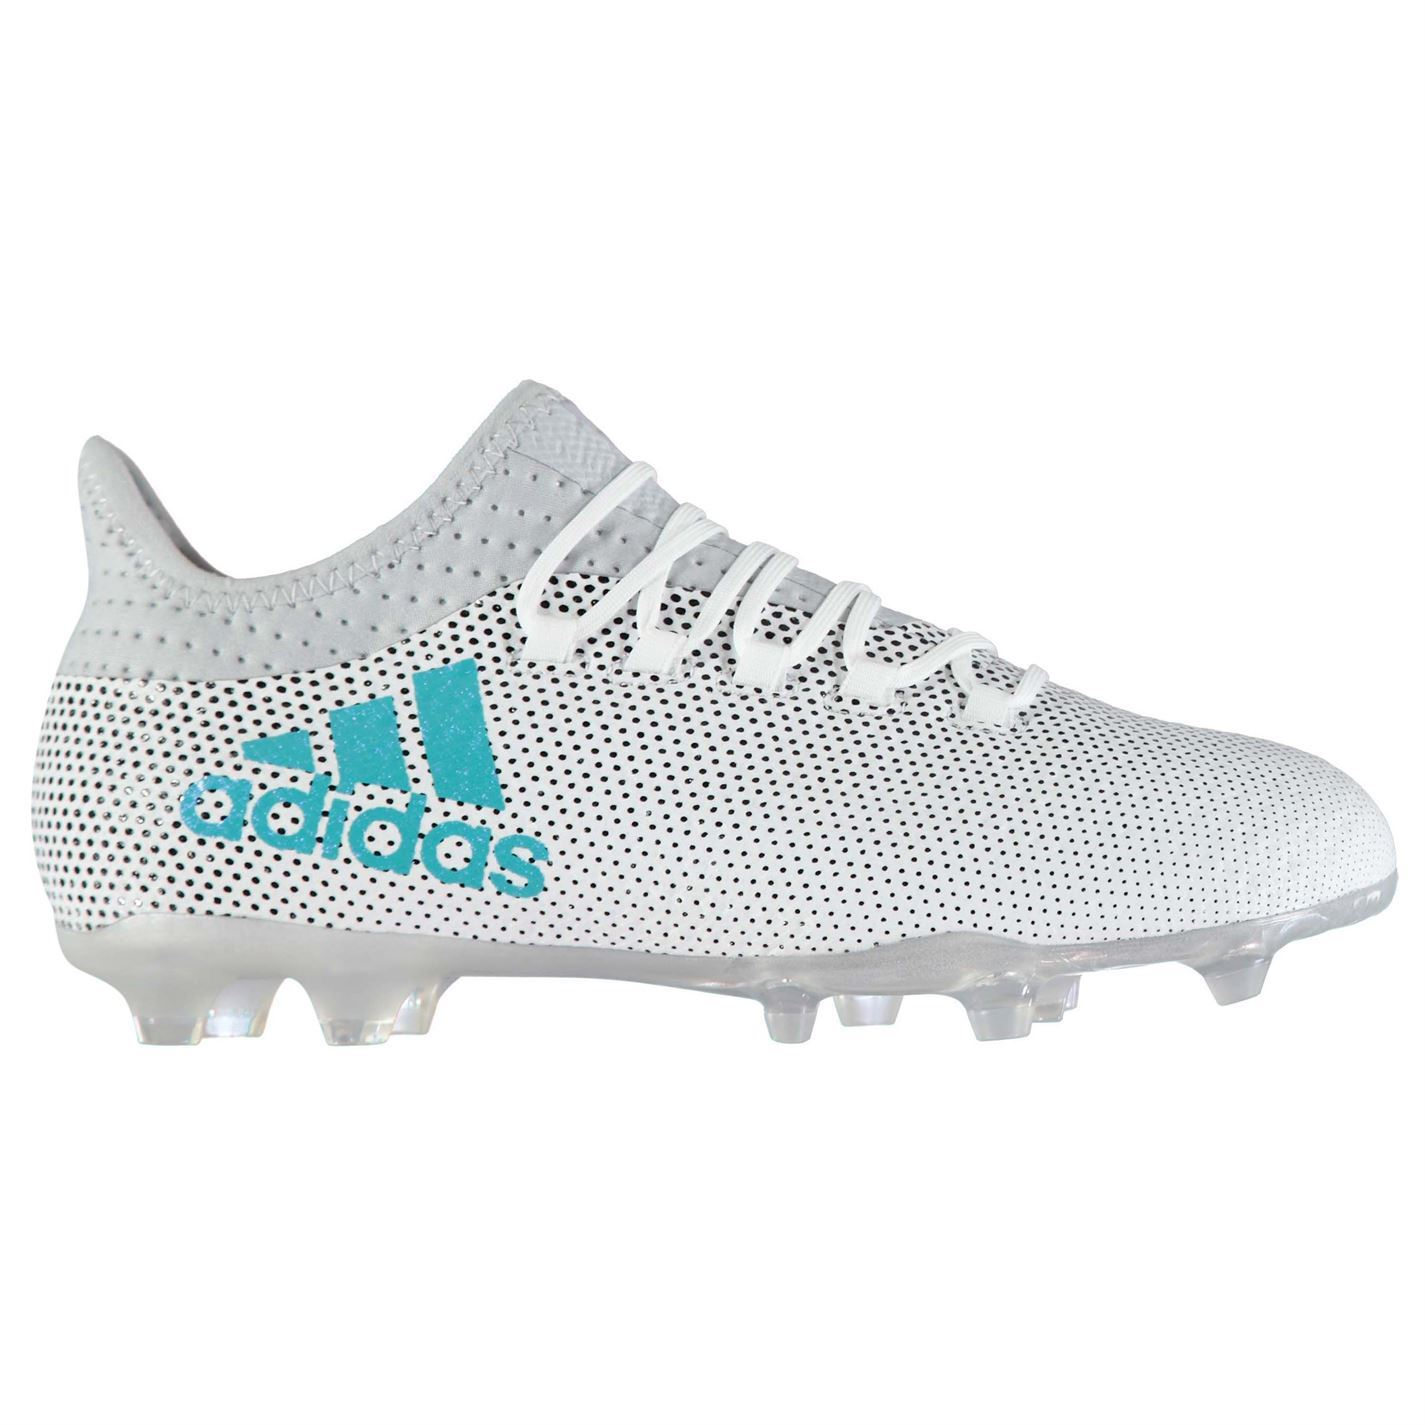 adidas Mens X 17.2 FG Football Boots Shoes Studs Lace Up Ventilation Holes 33d1f951c